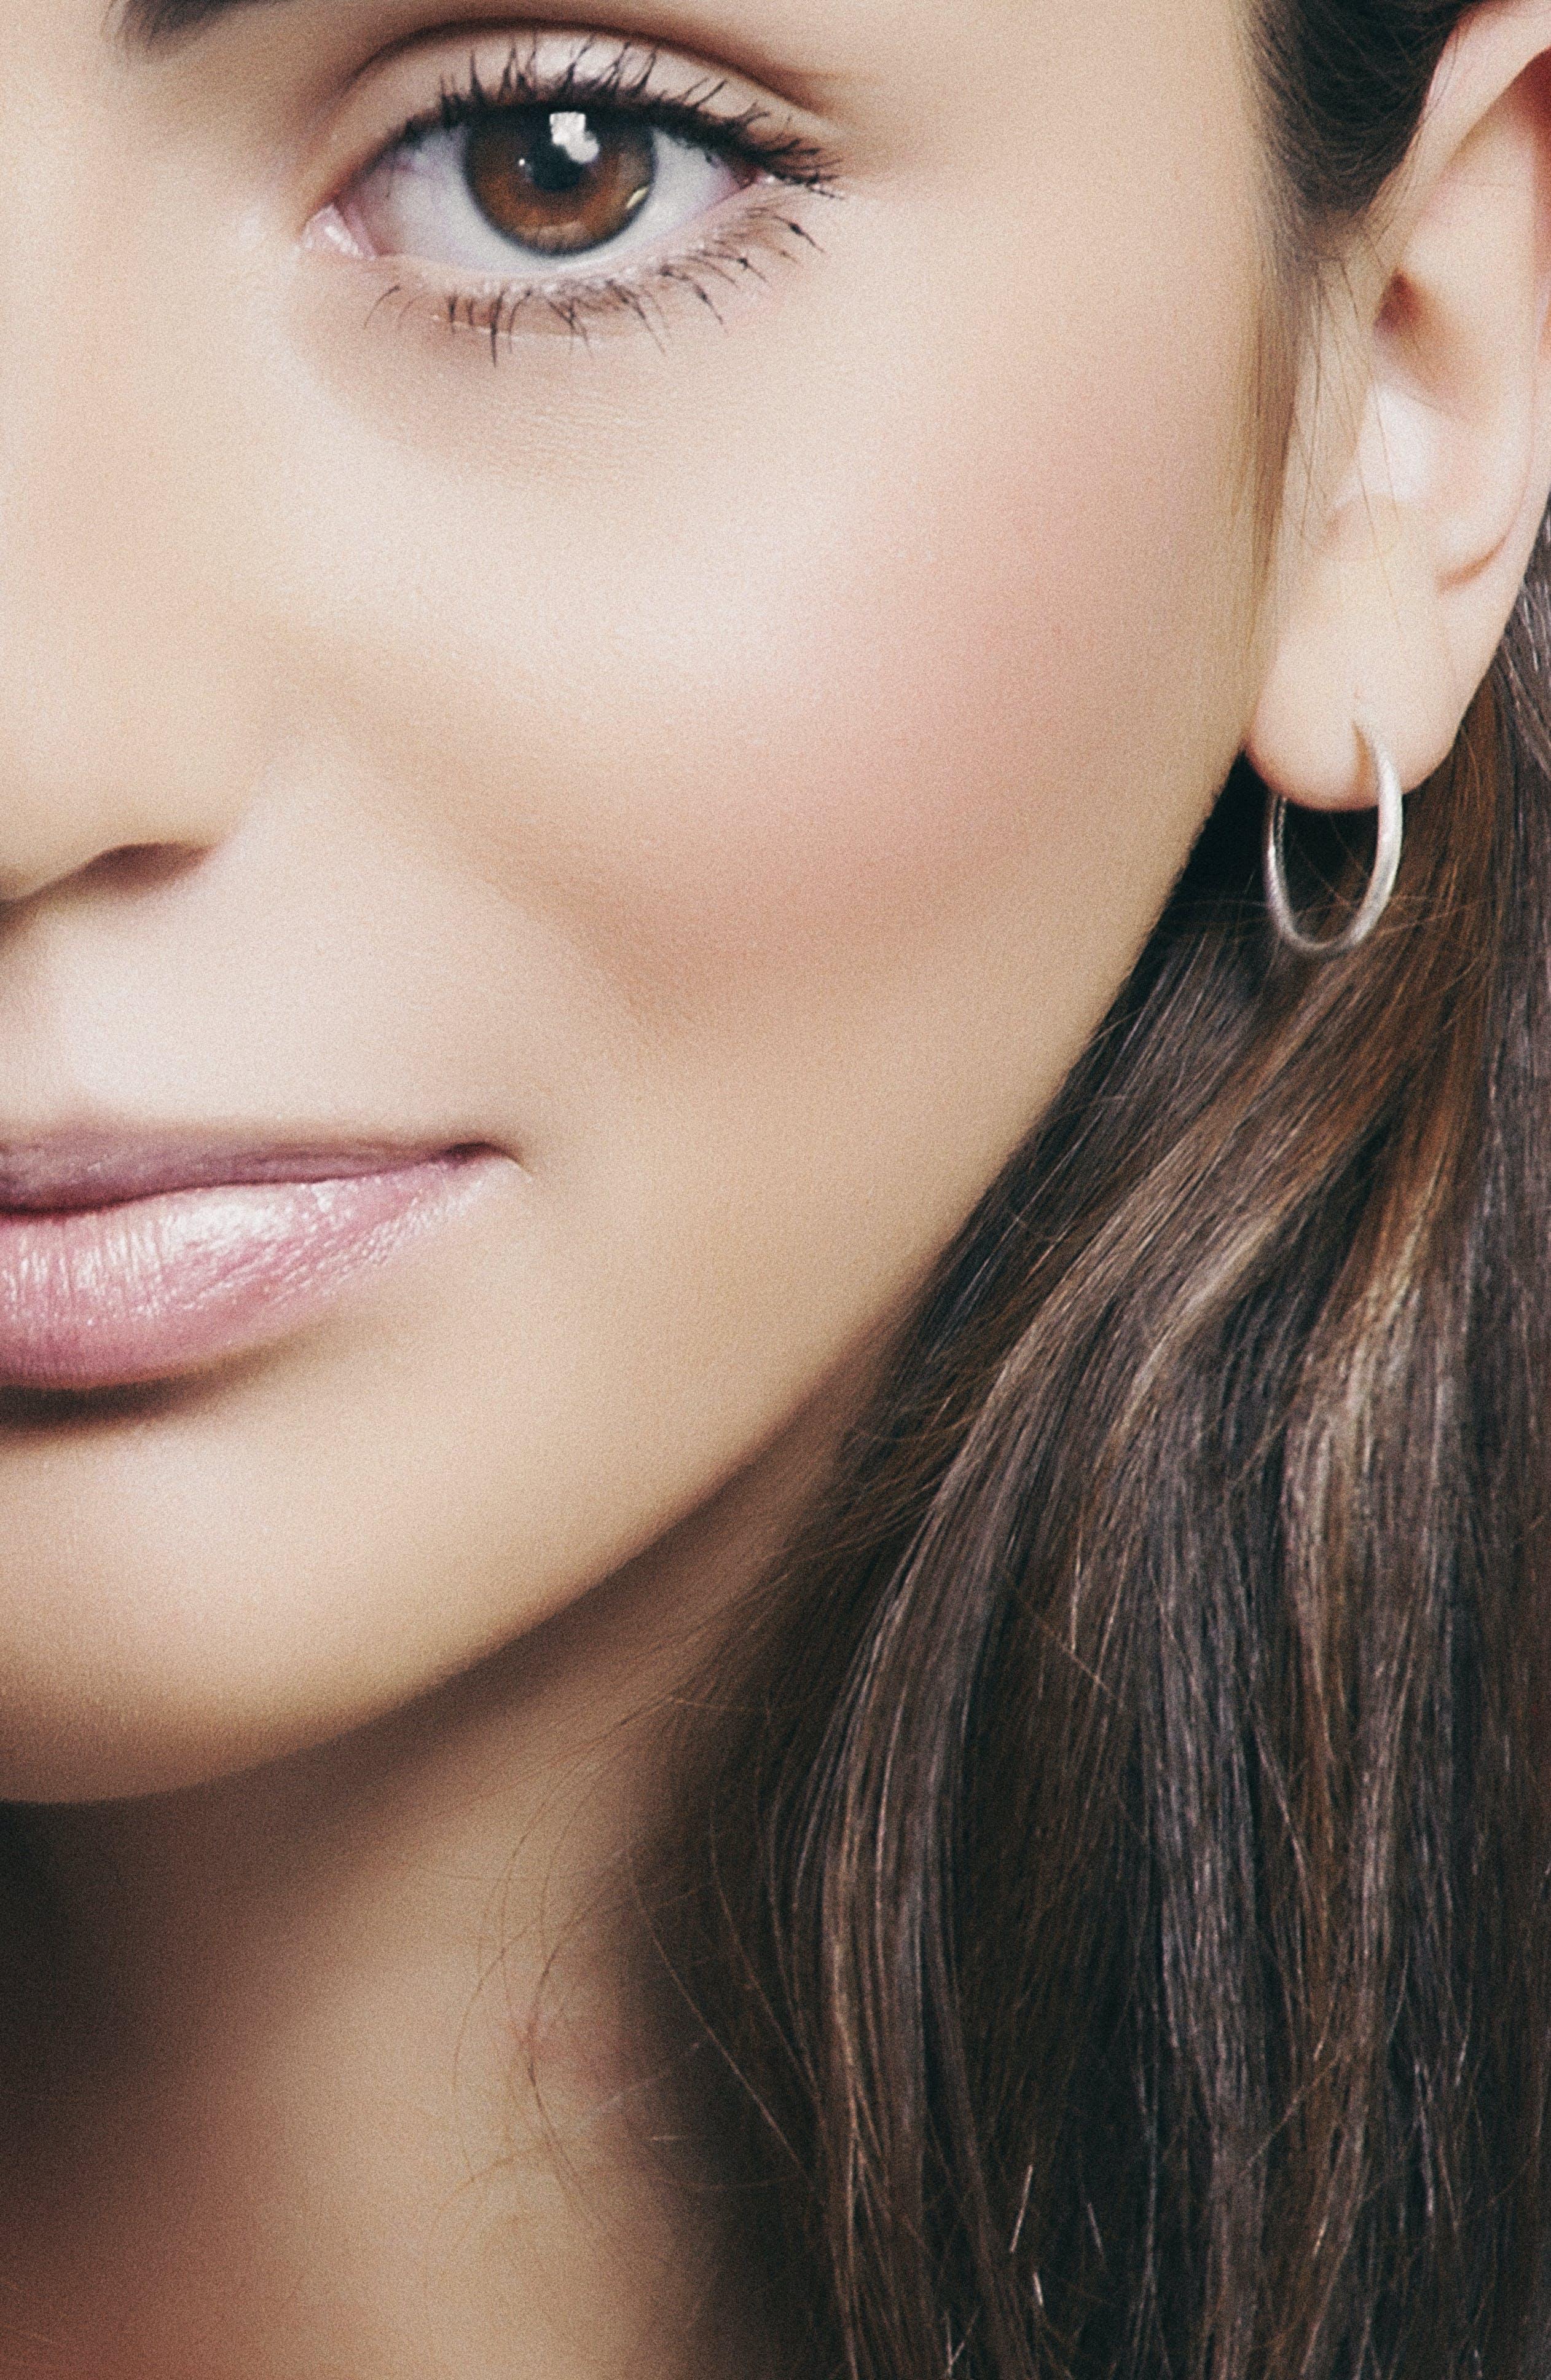 Free stock photo of Глаза, губы, девушка, женский пол